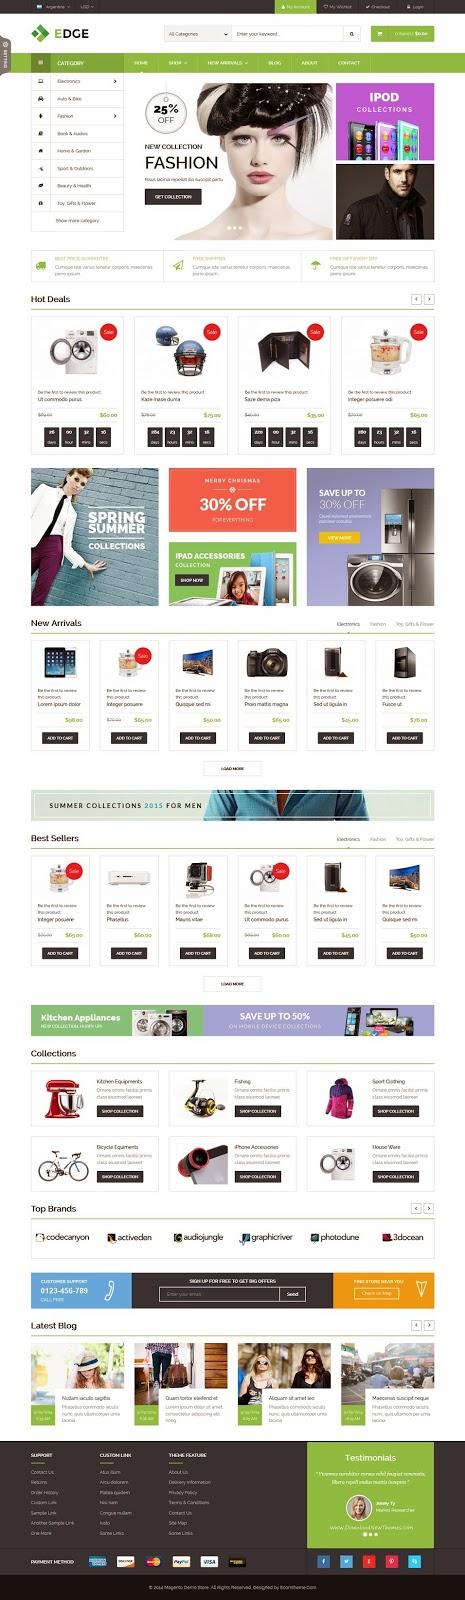 Responsive Multipurpose Magento Theme 2015